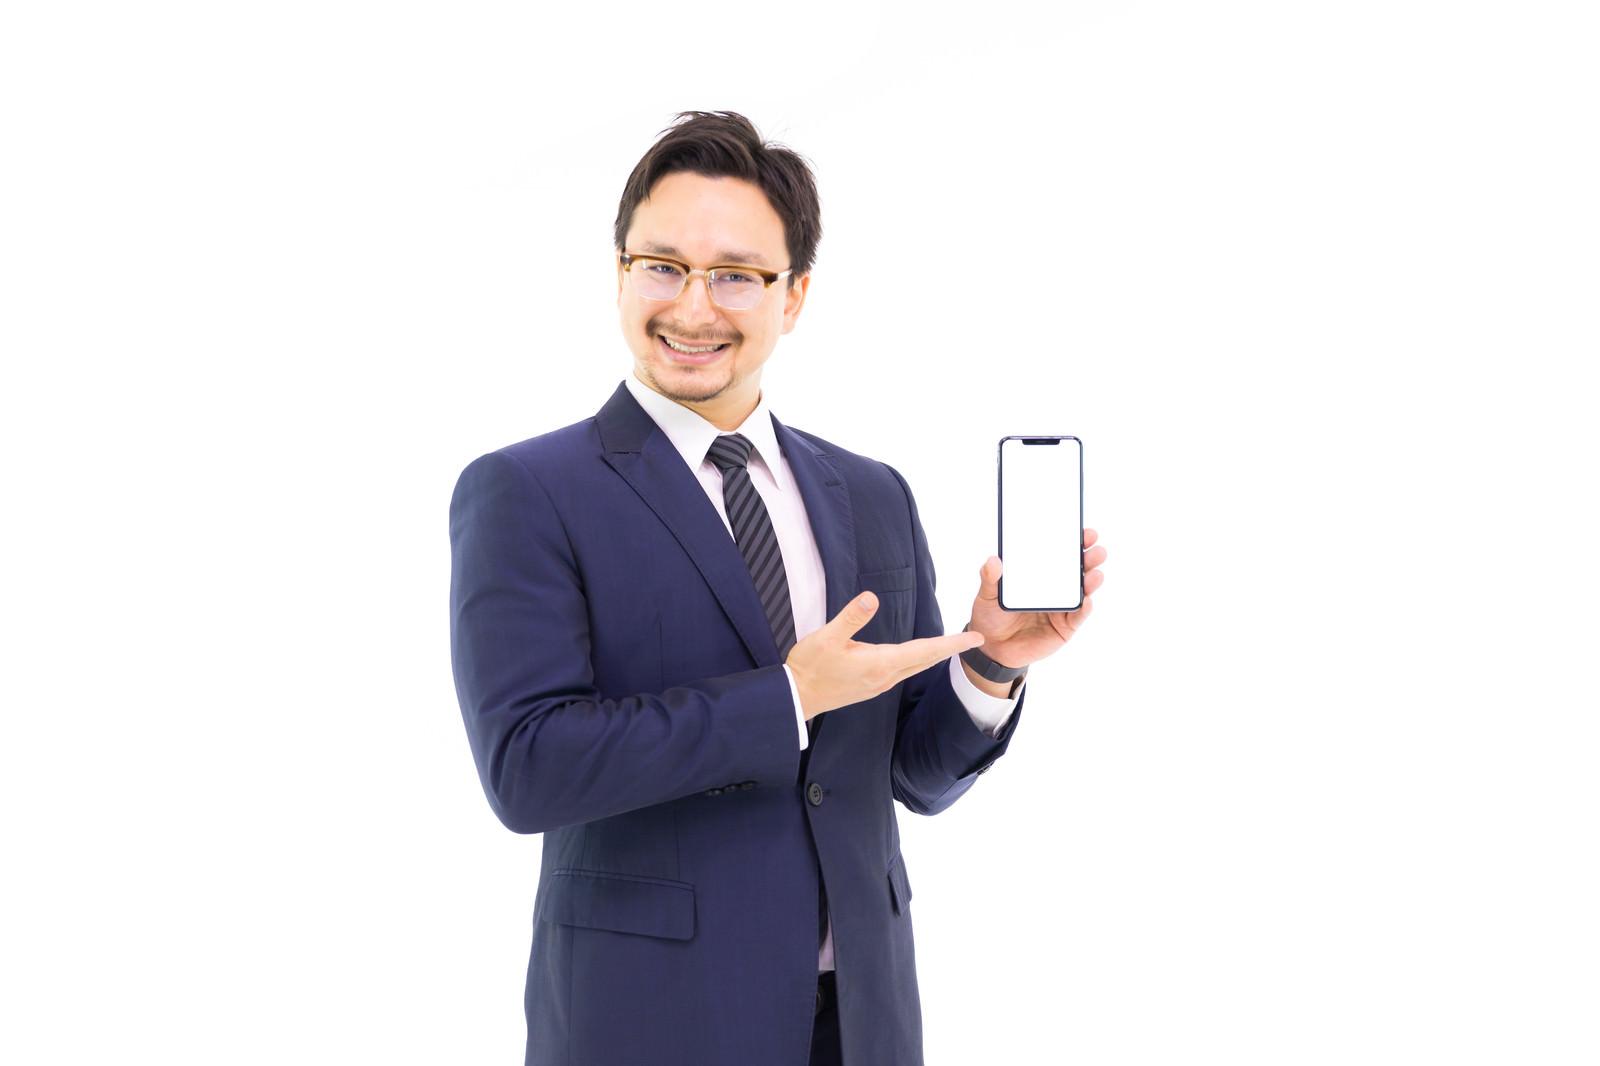 「iPhone XS Maxの6.5インチ大画面を提案するドイツ人ハーフiPhone XS Maxの6.5インチ大画面を提案するドイツ人ハーフ」[モデル:Max_Ezaki]のフリー写真素材を拡大